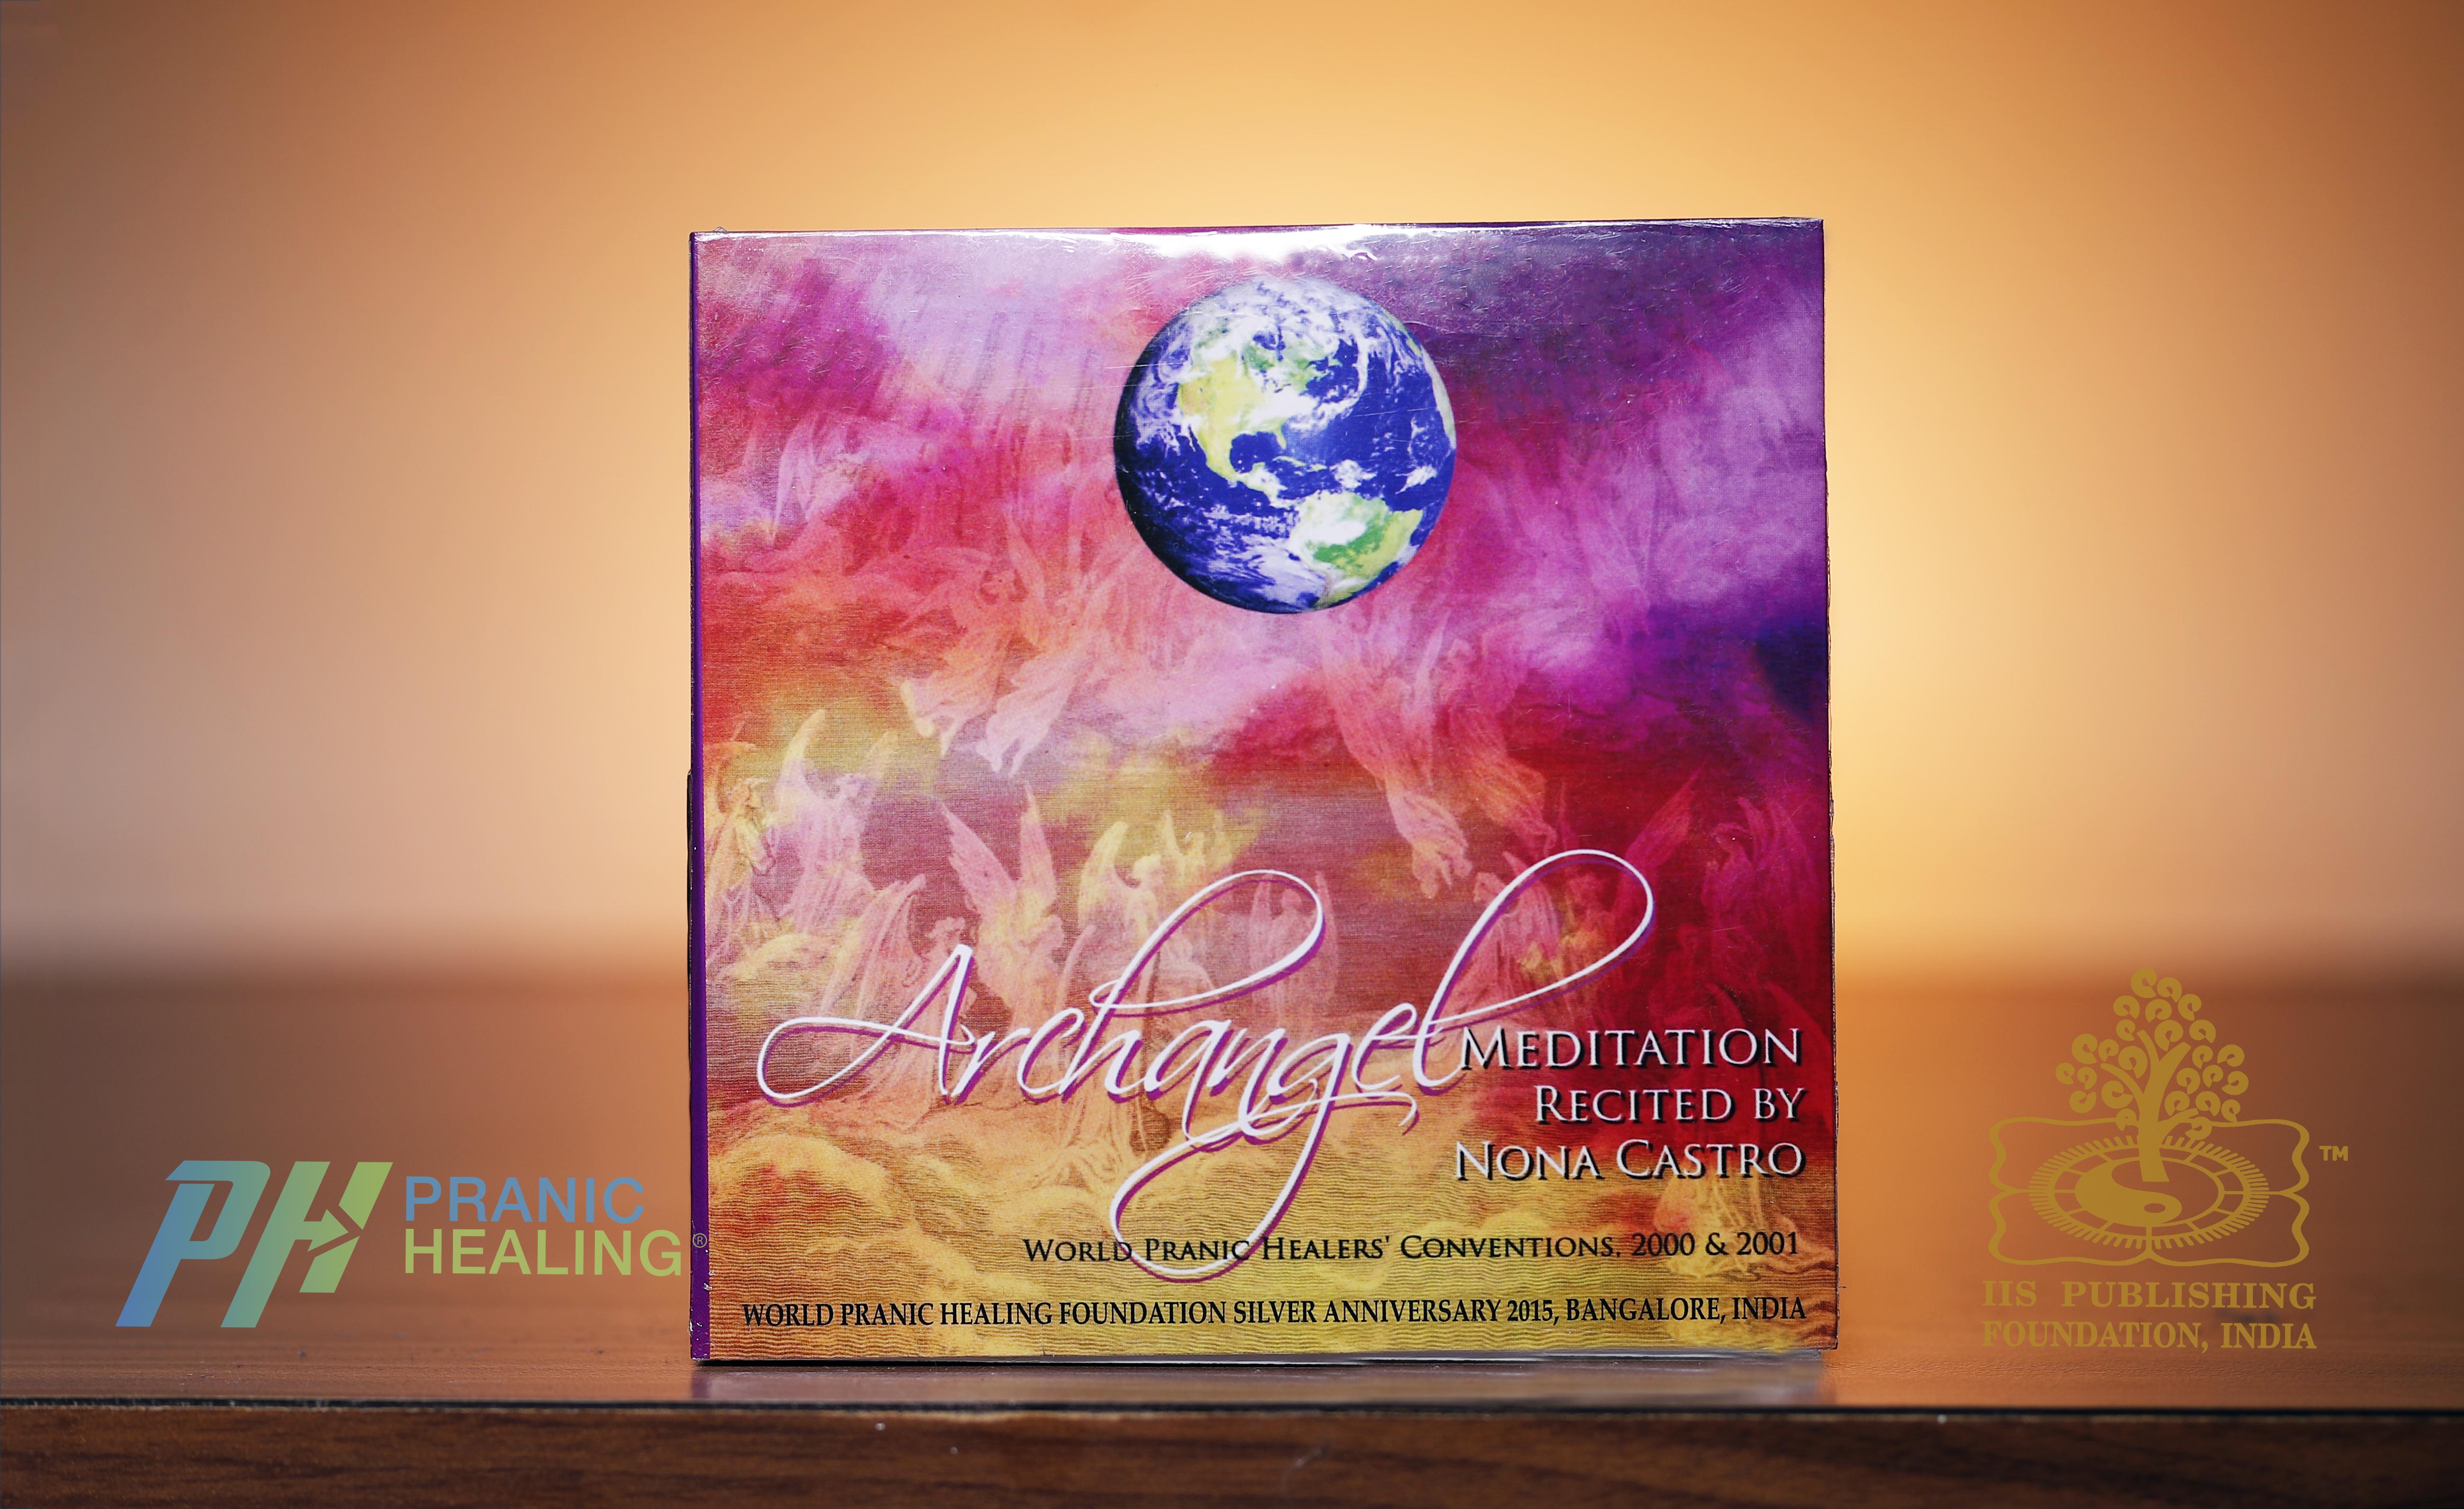 https://shop.pranichealingmumbai.com/products/archangel-meditation-cd